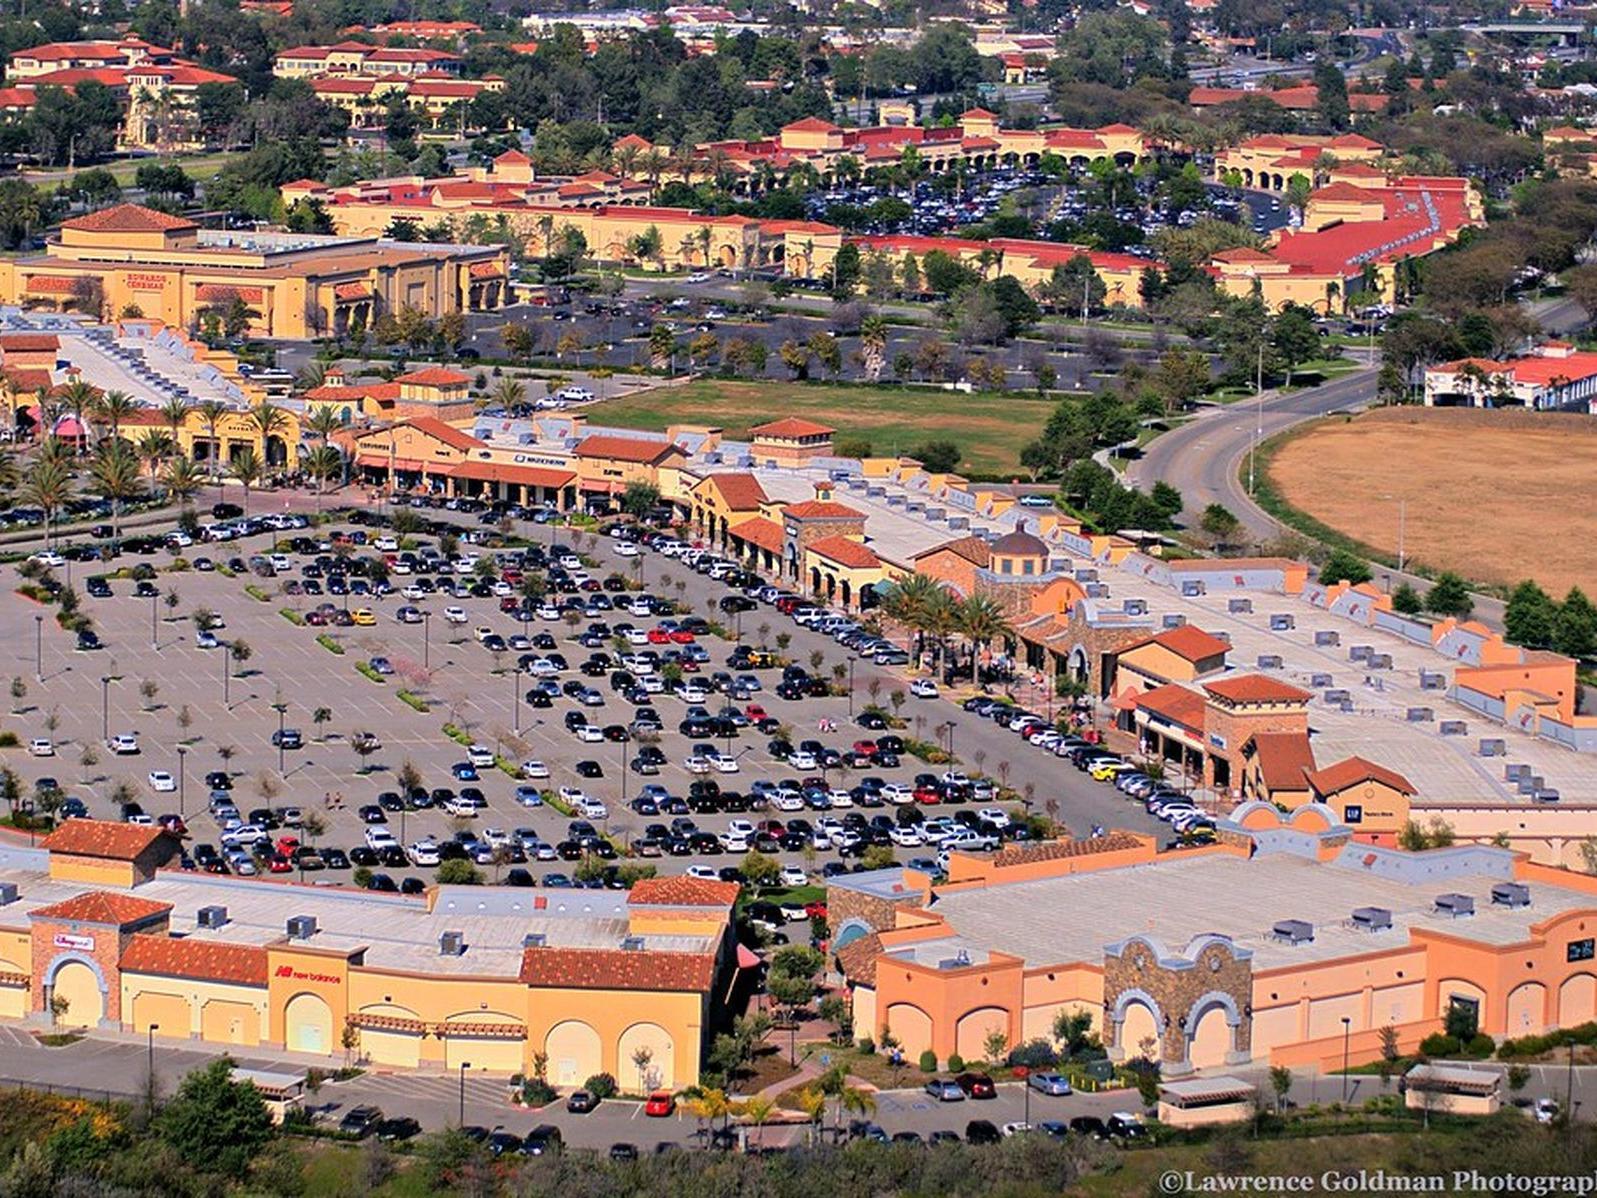 aerial shot of shopping plaza